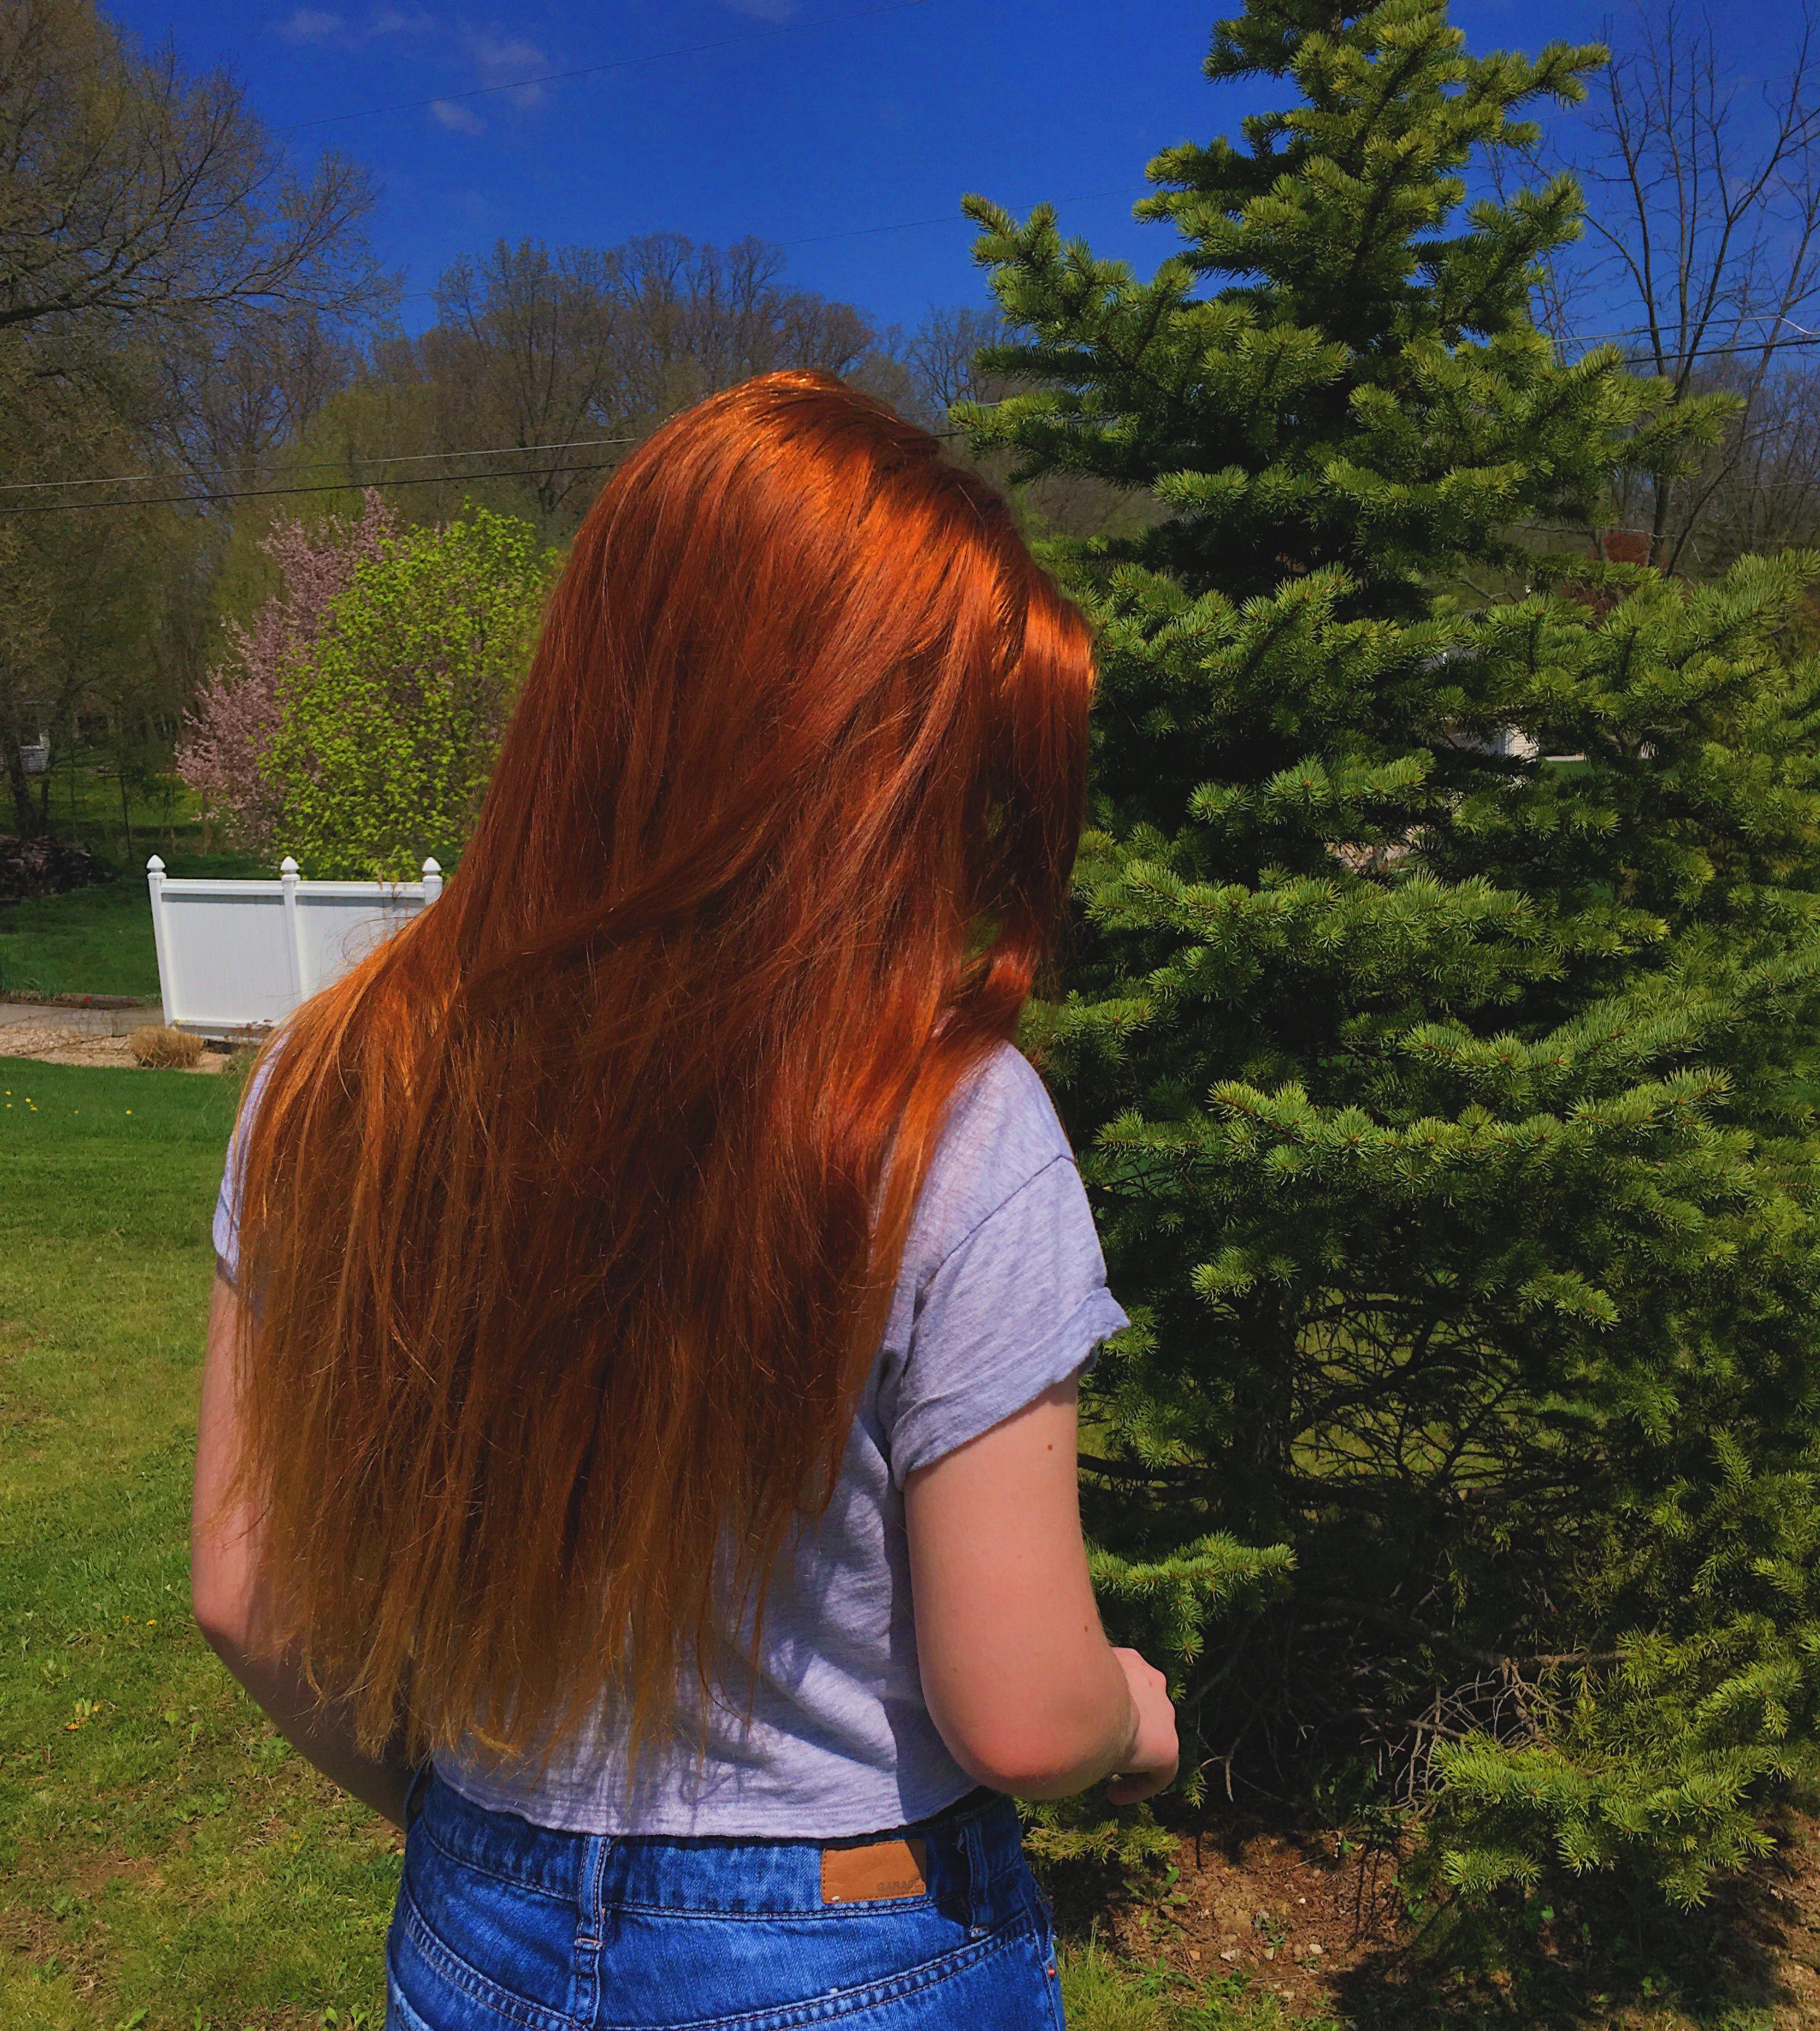 Hairgoals Ginger Redhead Longhair Nature Tumblr Nature Long Hair Styles Ginger Hair Tumblr Hair